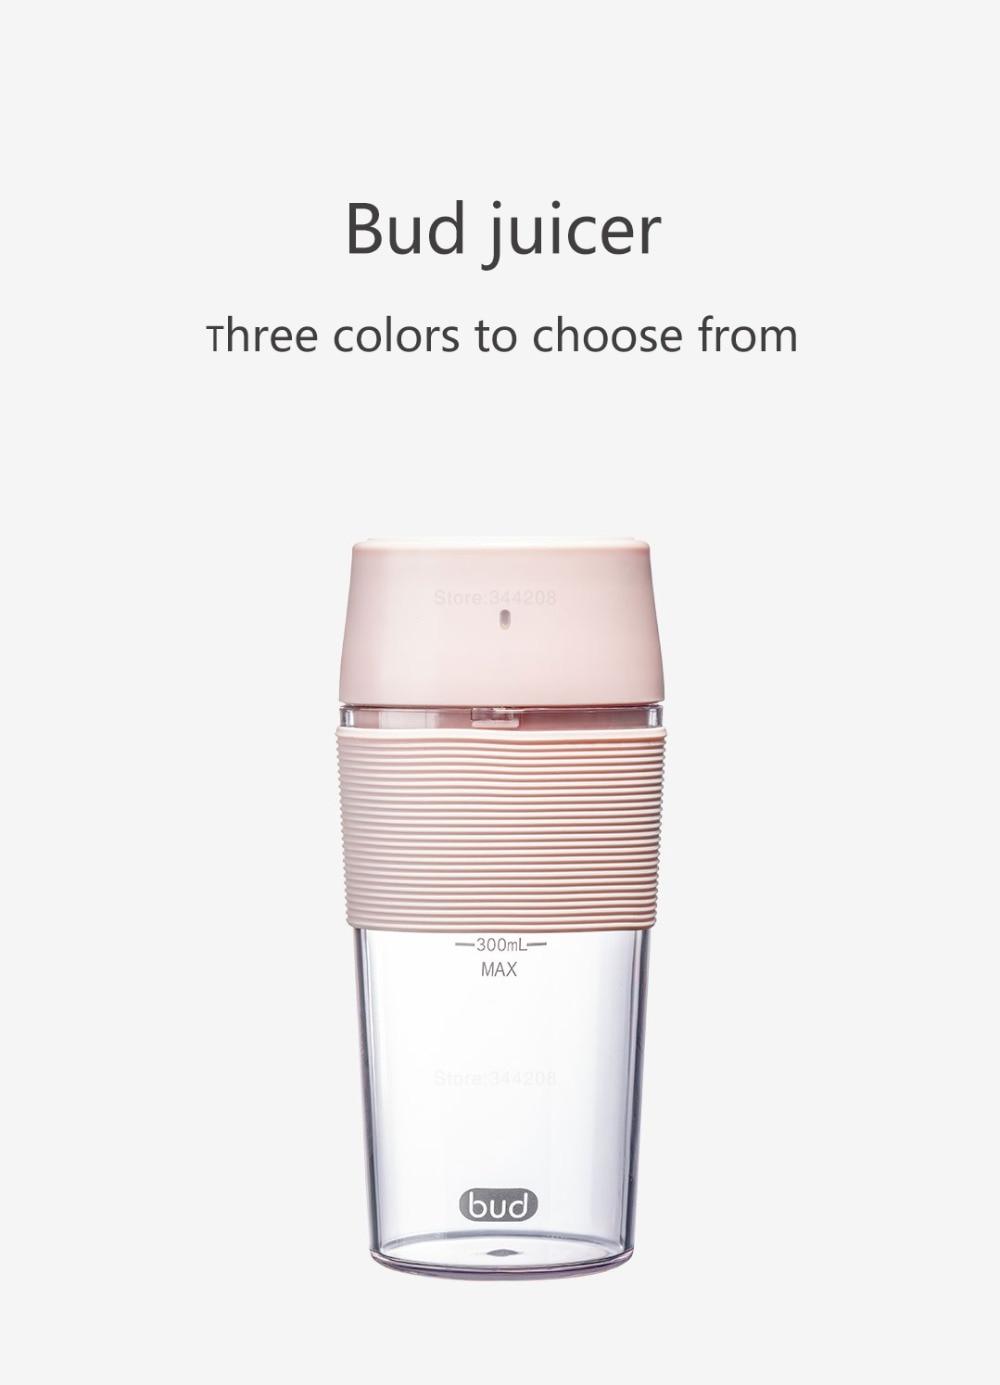 Hd595624694de42e8a1cbde2af0262053d XIAOMI MIJIA Bud BR25E Blender Portable Fruit Cup Electric Kitchen Mixer Juicer food processor Machine 300ML Magnetic charging